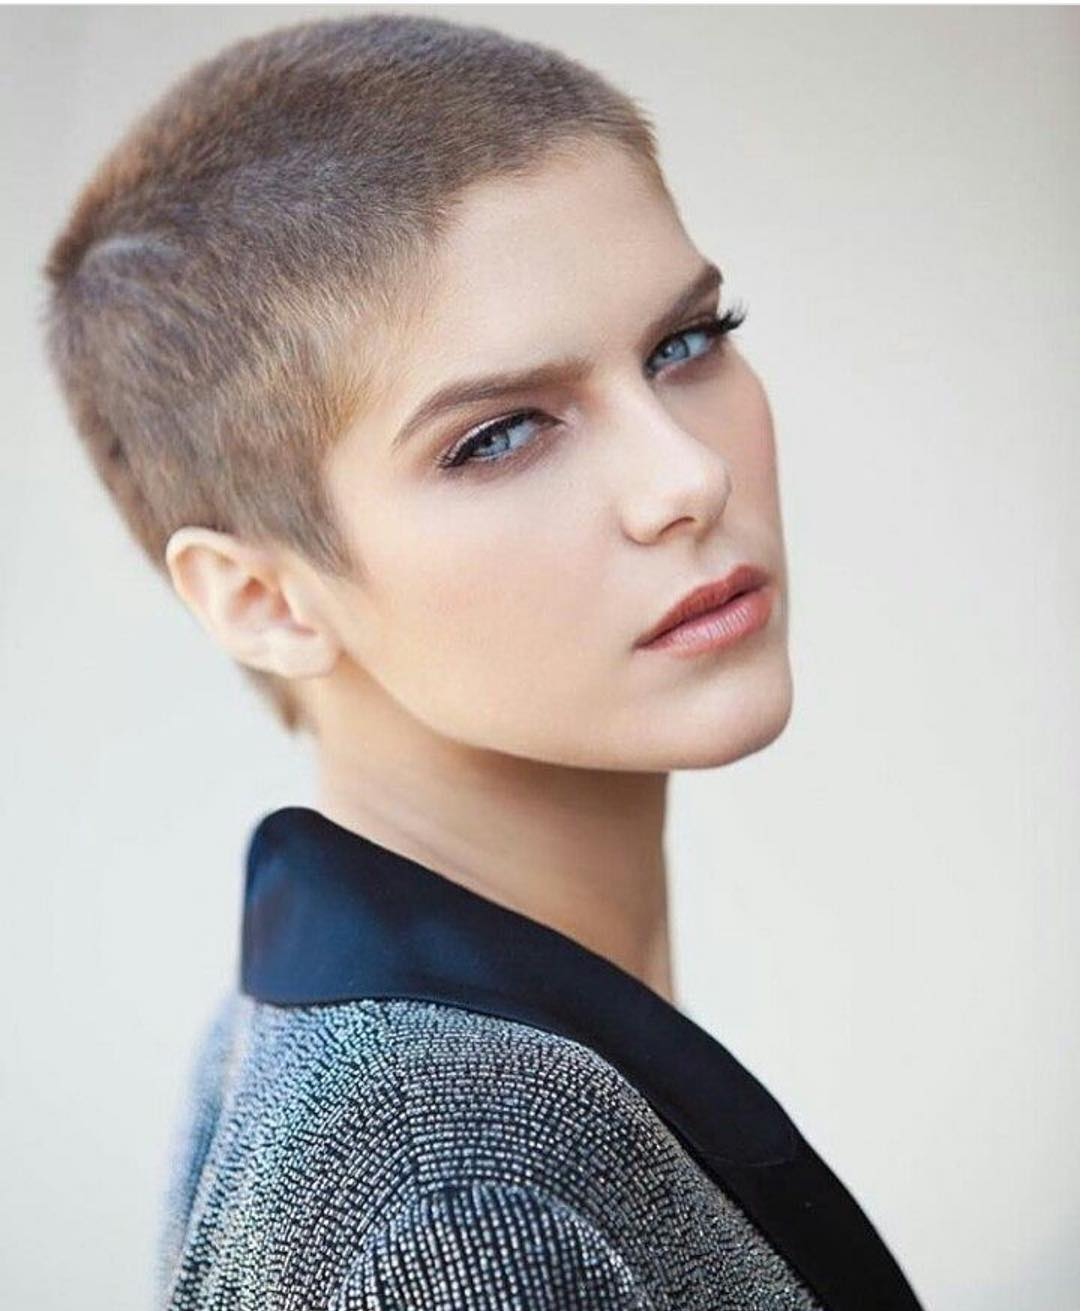 cabelo raspado 5